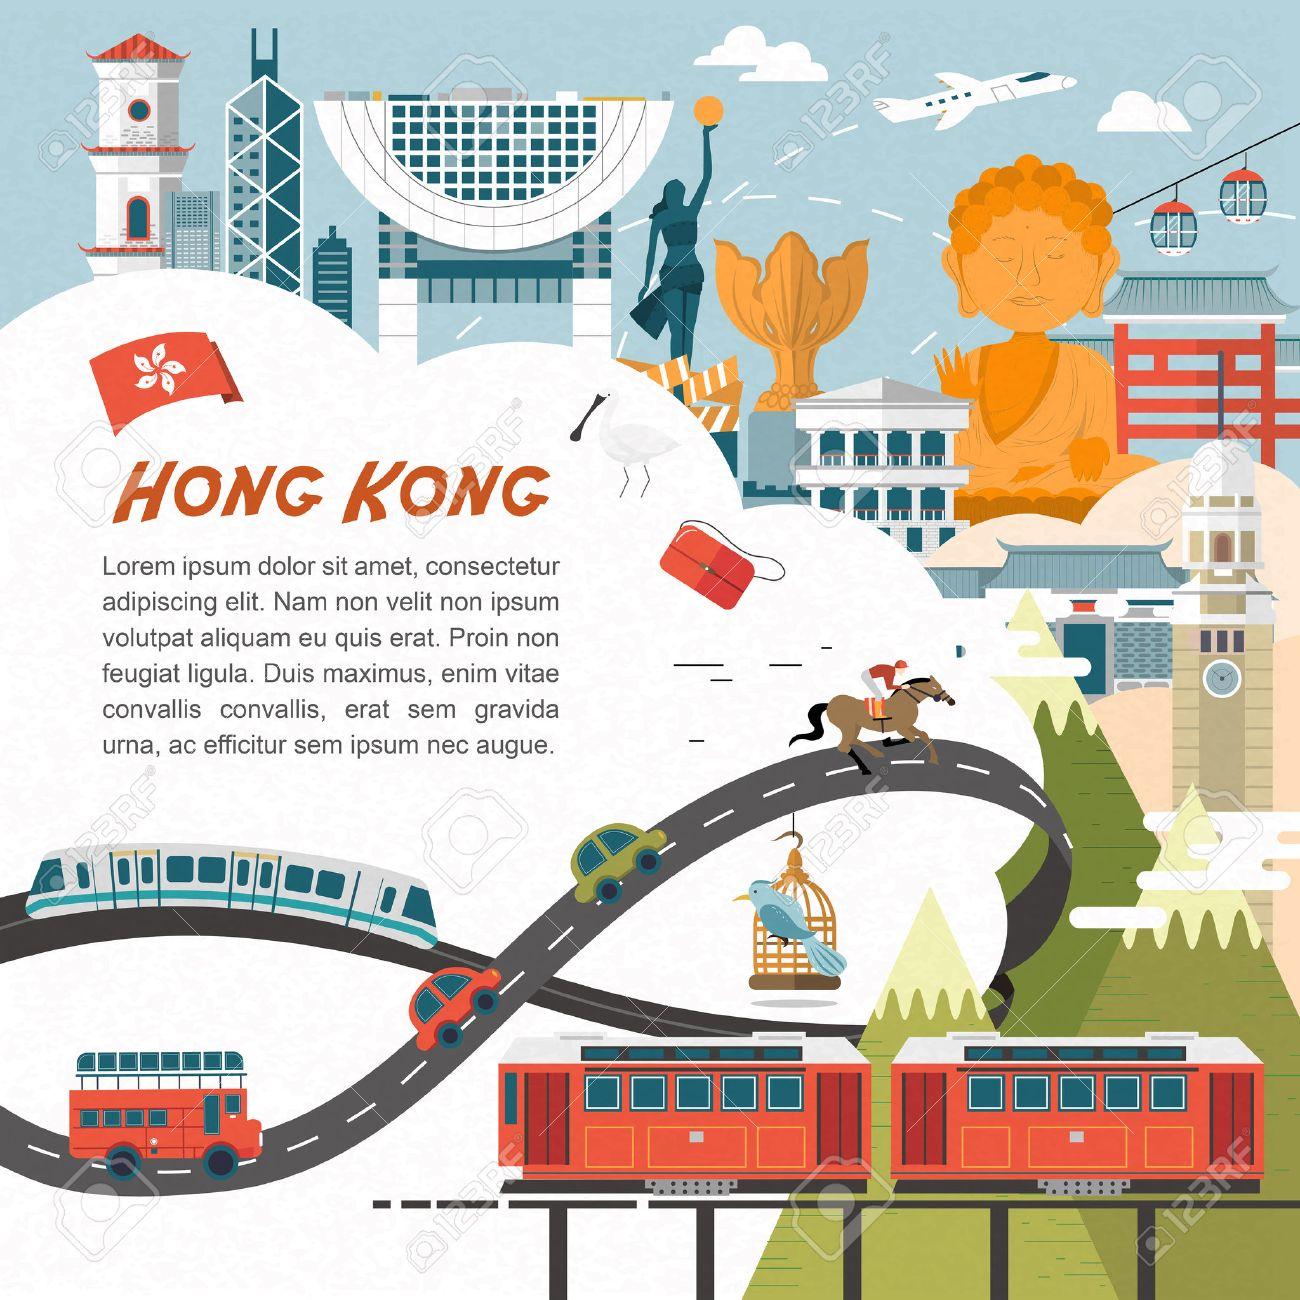 Poster design hong kong - Poster Design Hong Kong Vector Attractive Hong Kong Travel Concept Poster In Flat Design